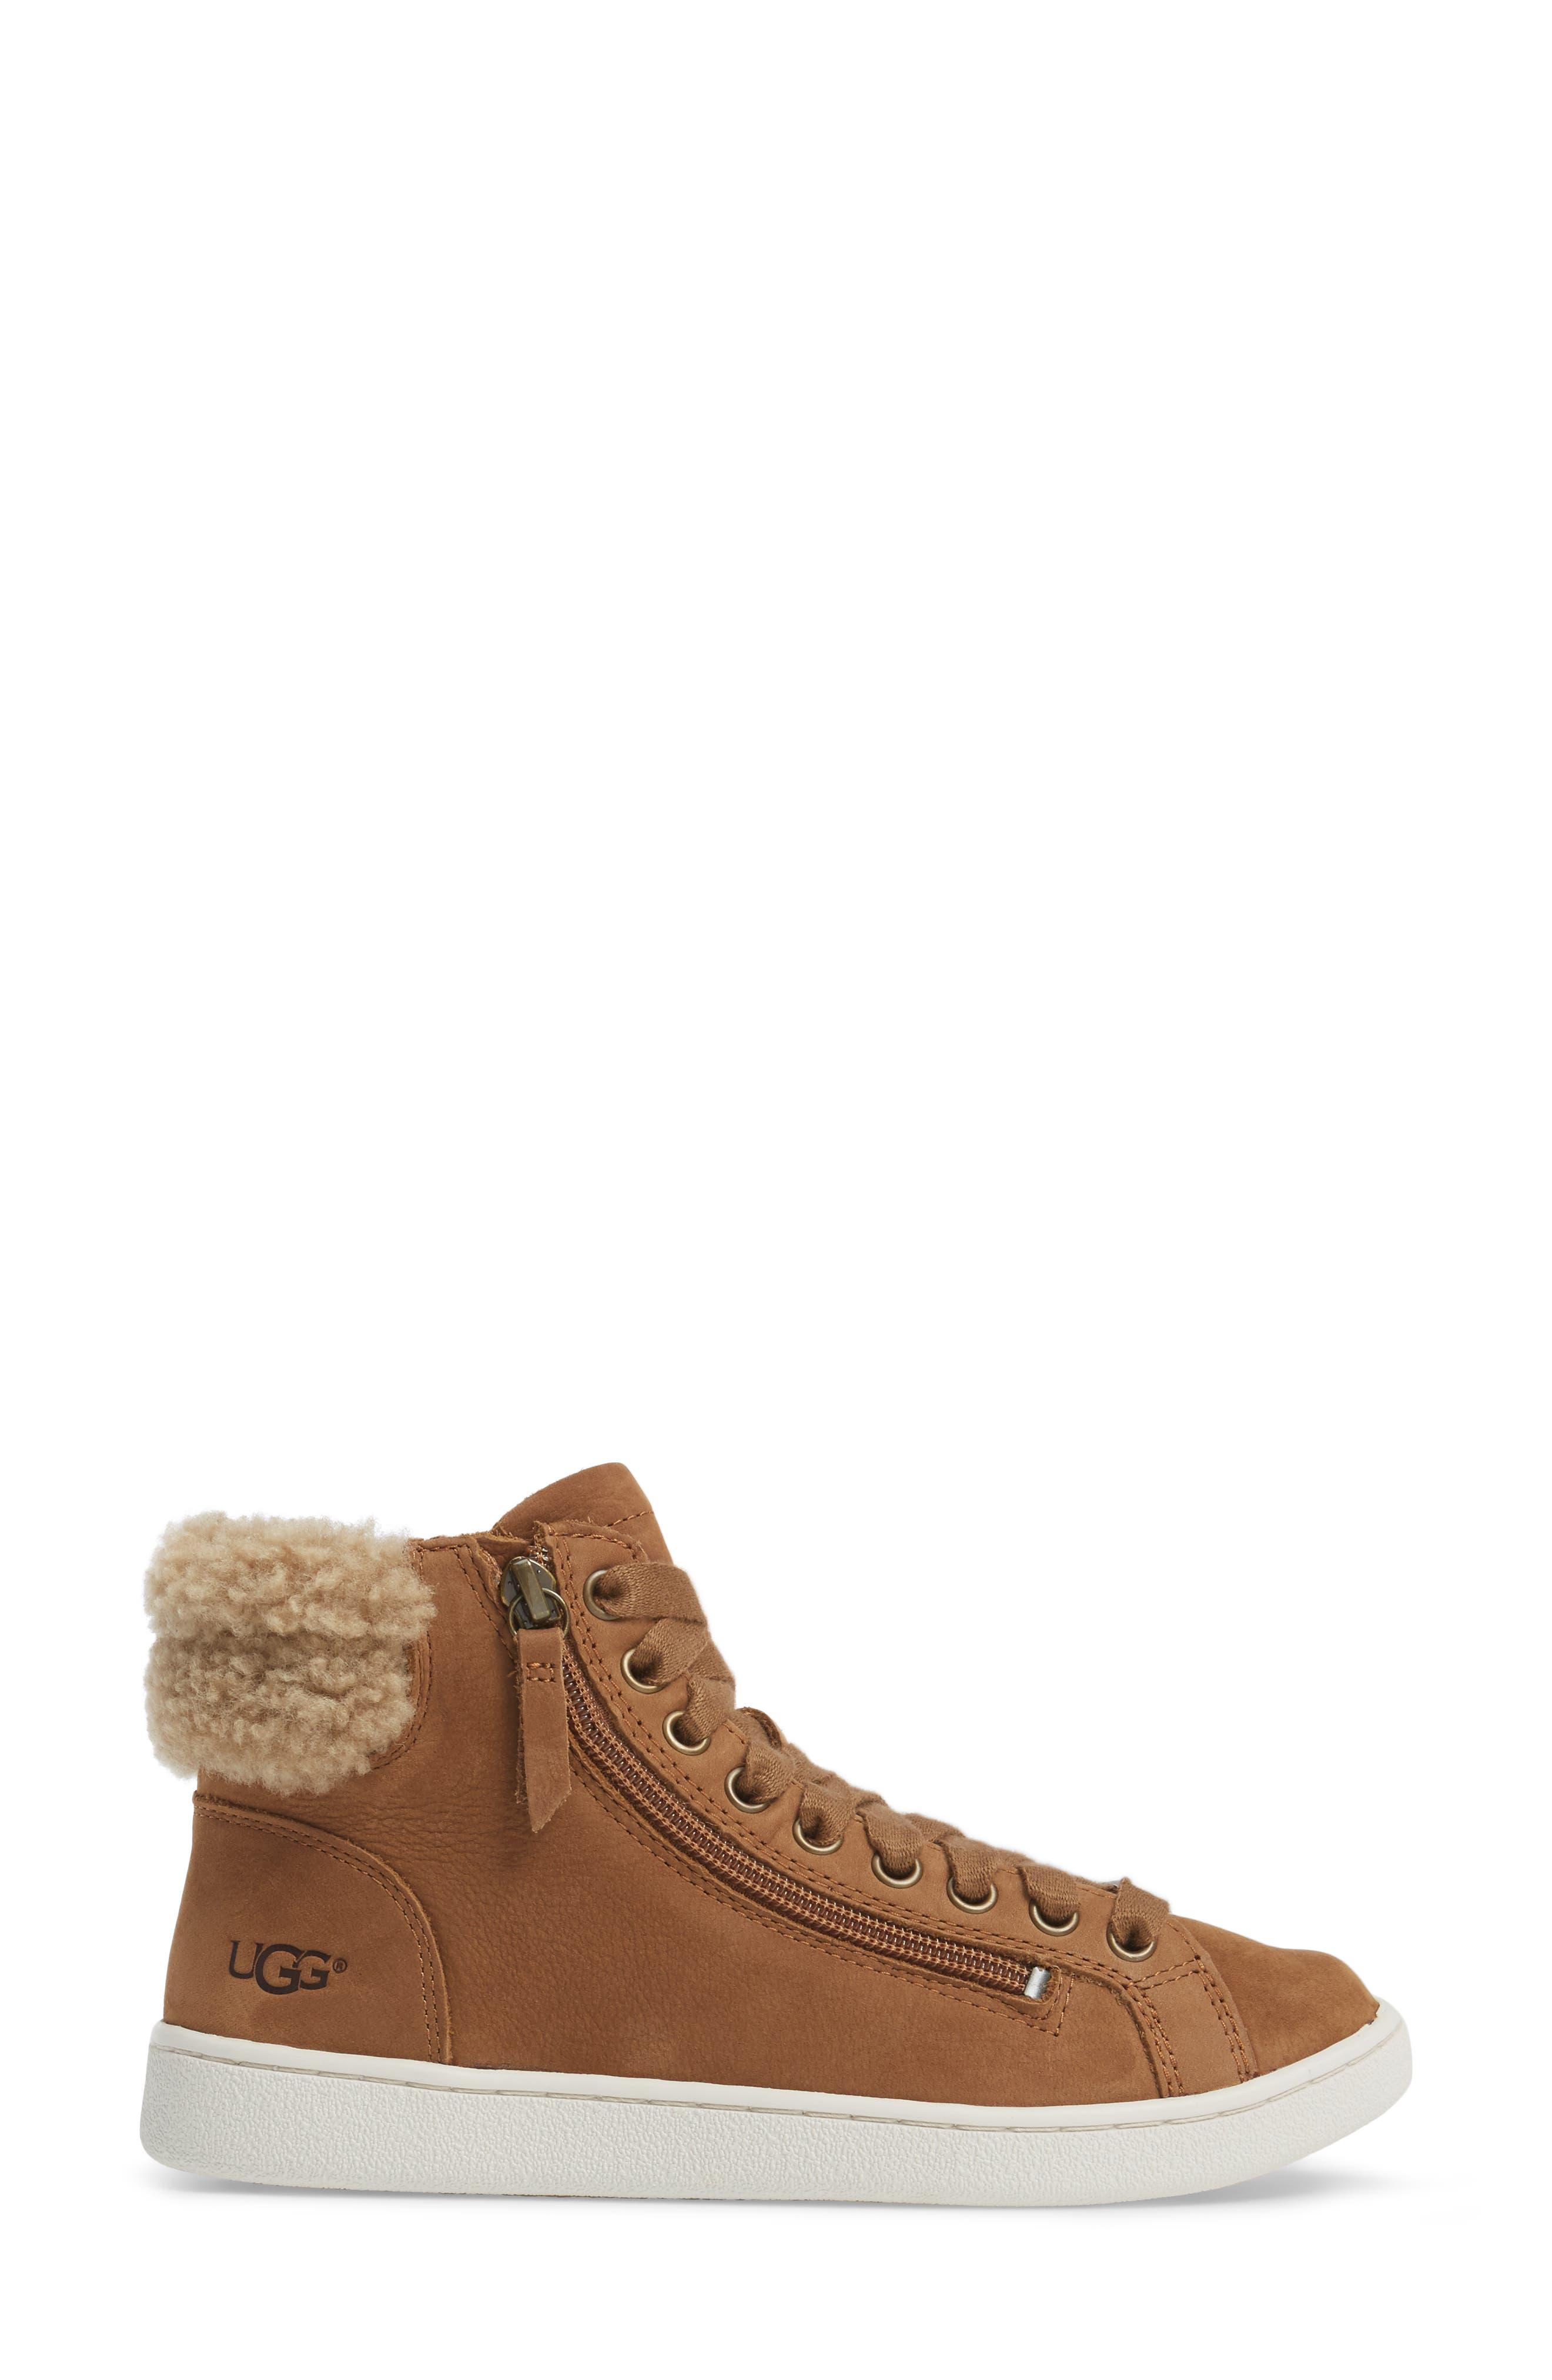 Alternate Image 3  - UGG® Olive Genuine Shearling Cuff Sneaker (Women)